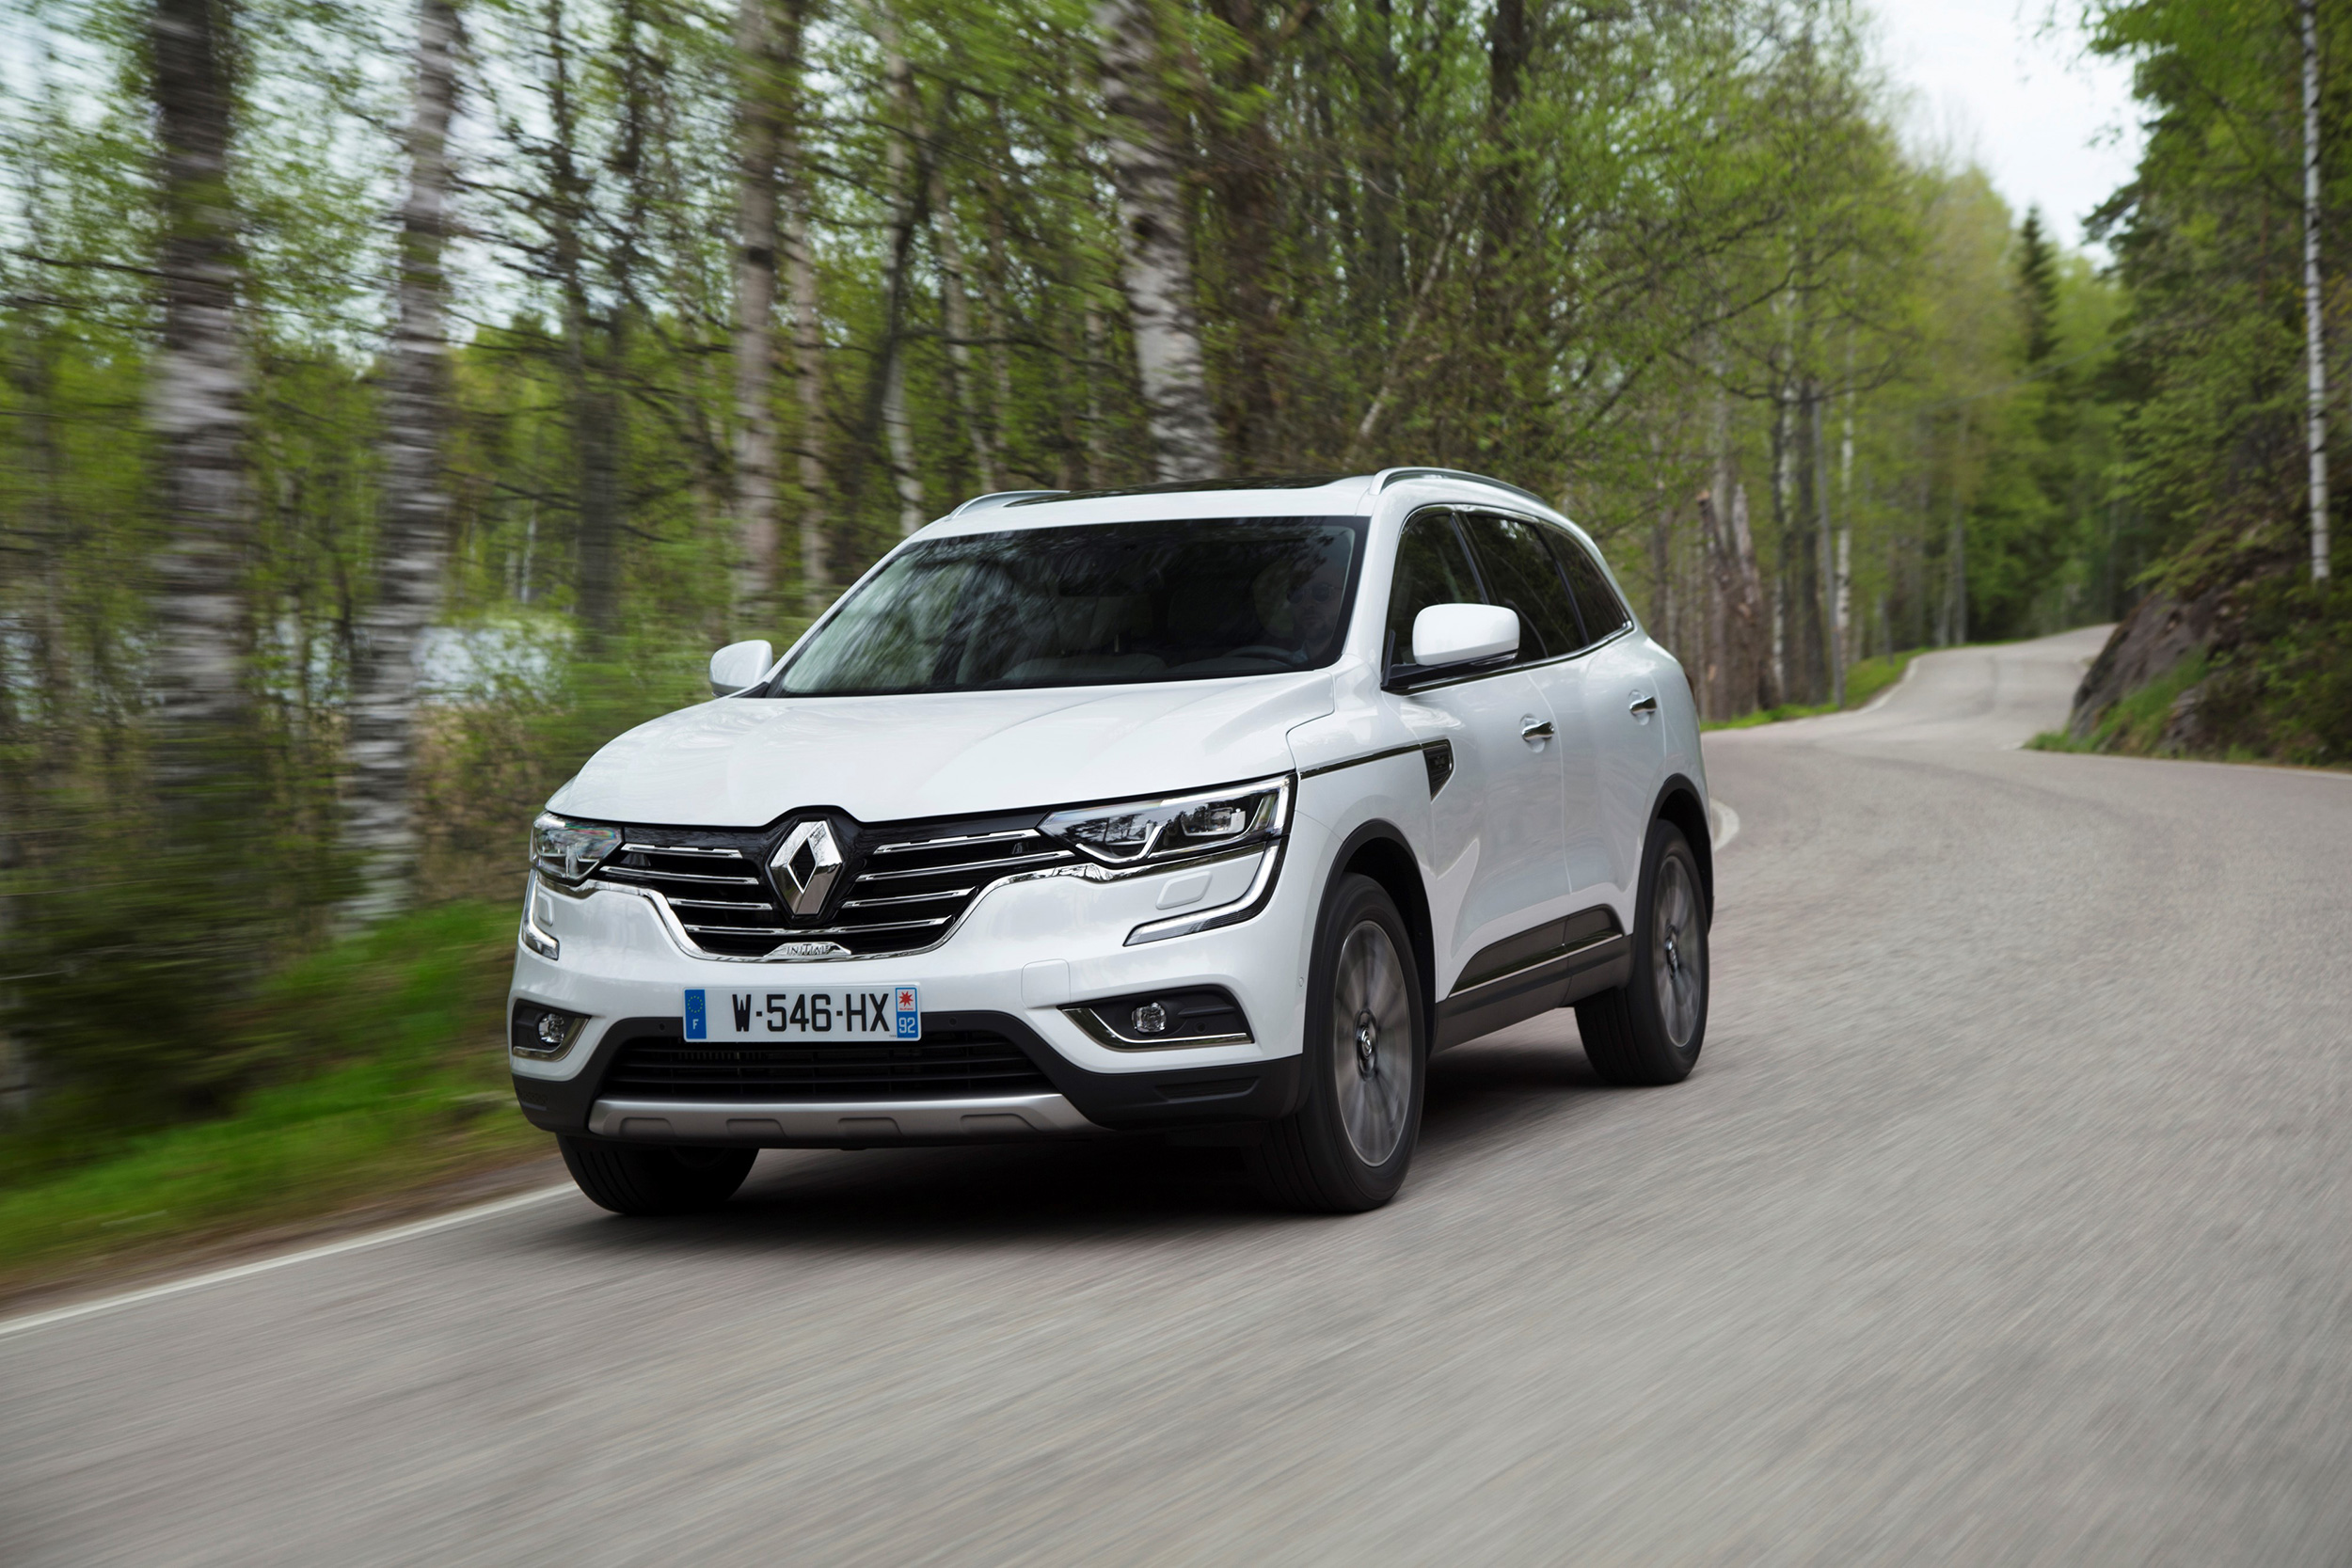 Review: Renault Koleos (2017)